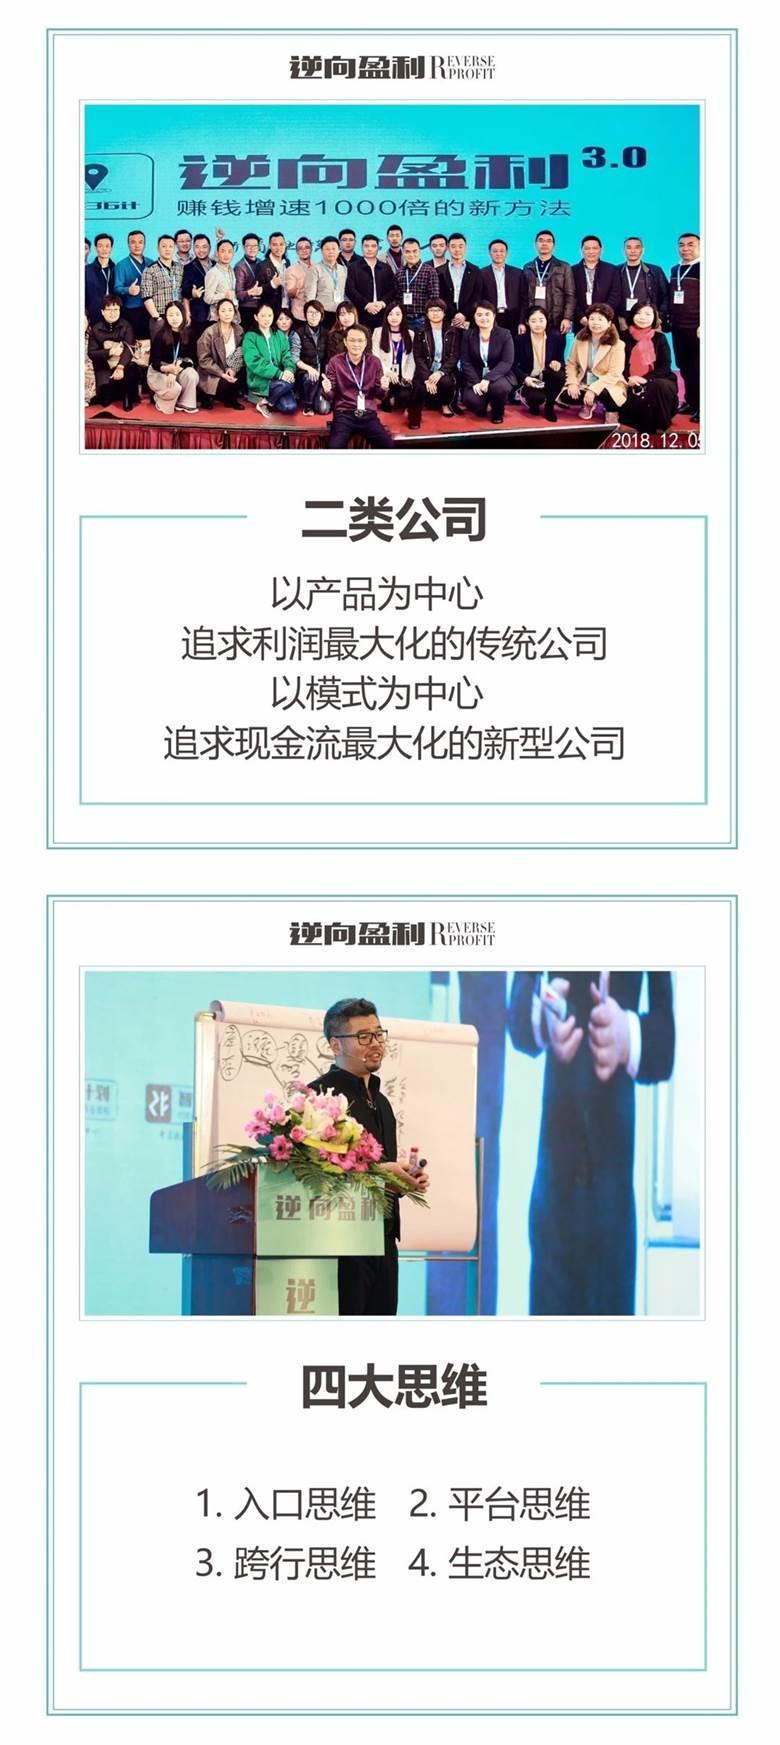 http://www.huodongxing.com/file/20191113/1063603644976/513659464403224.jpg